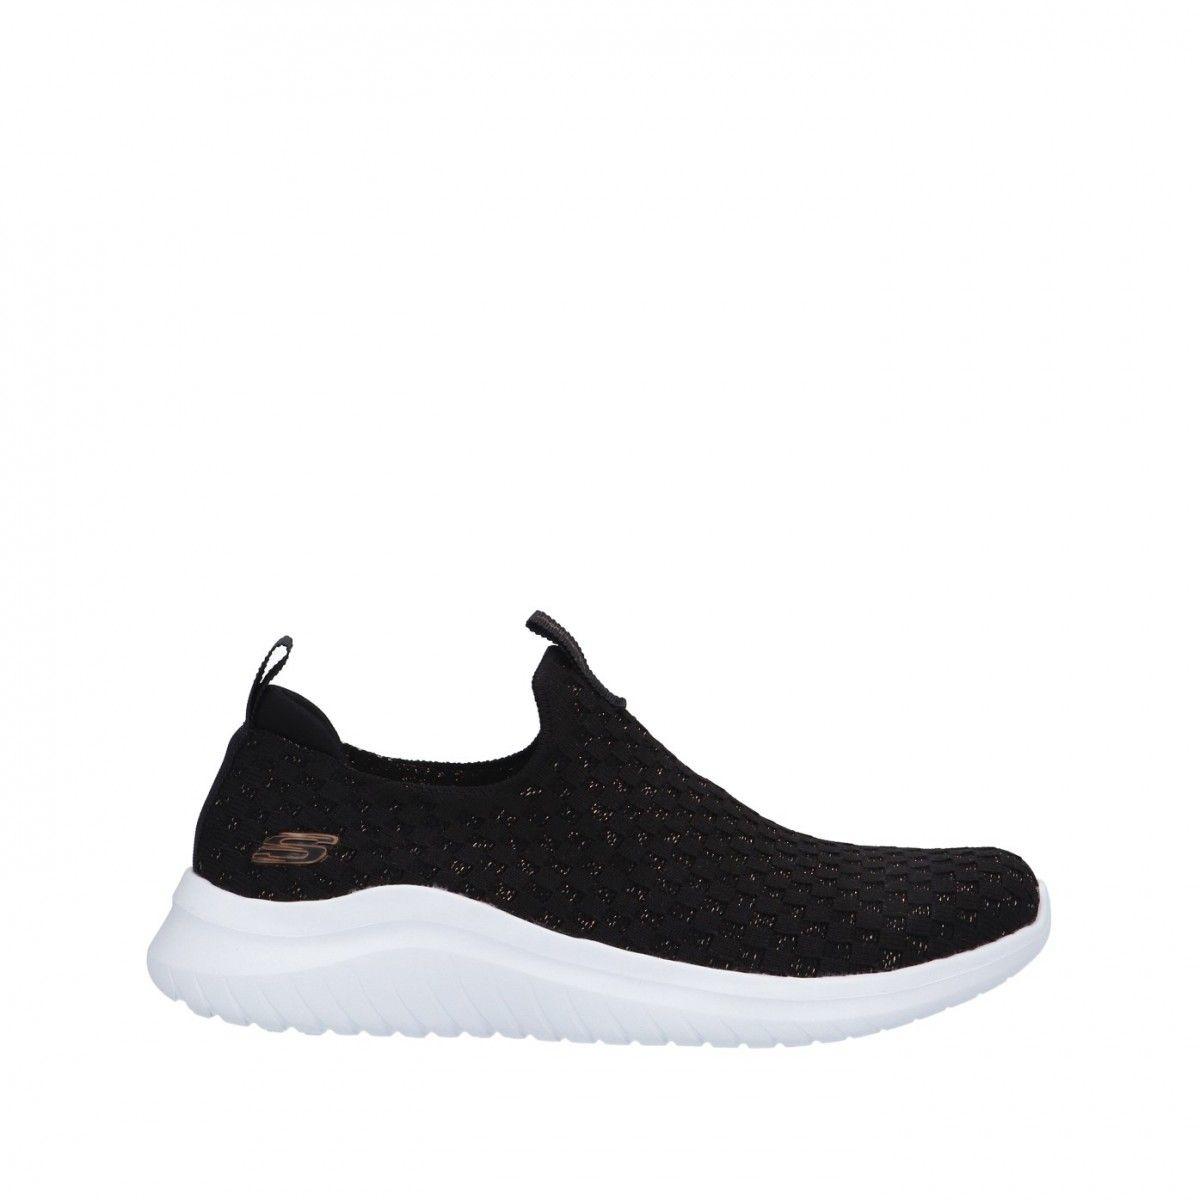 Skechers Sneaker Nero/oro...